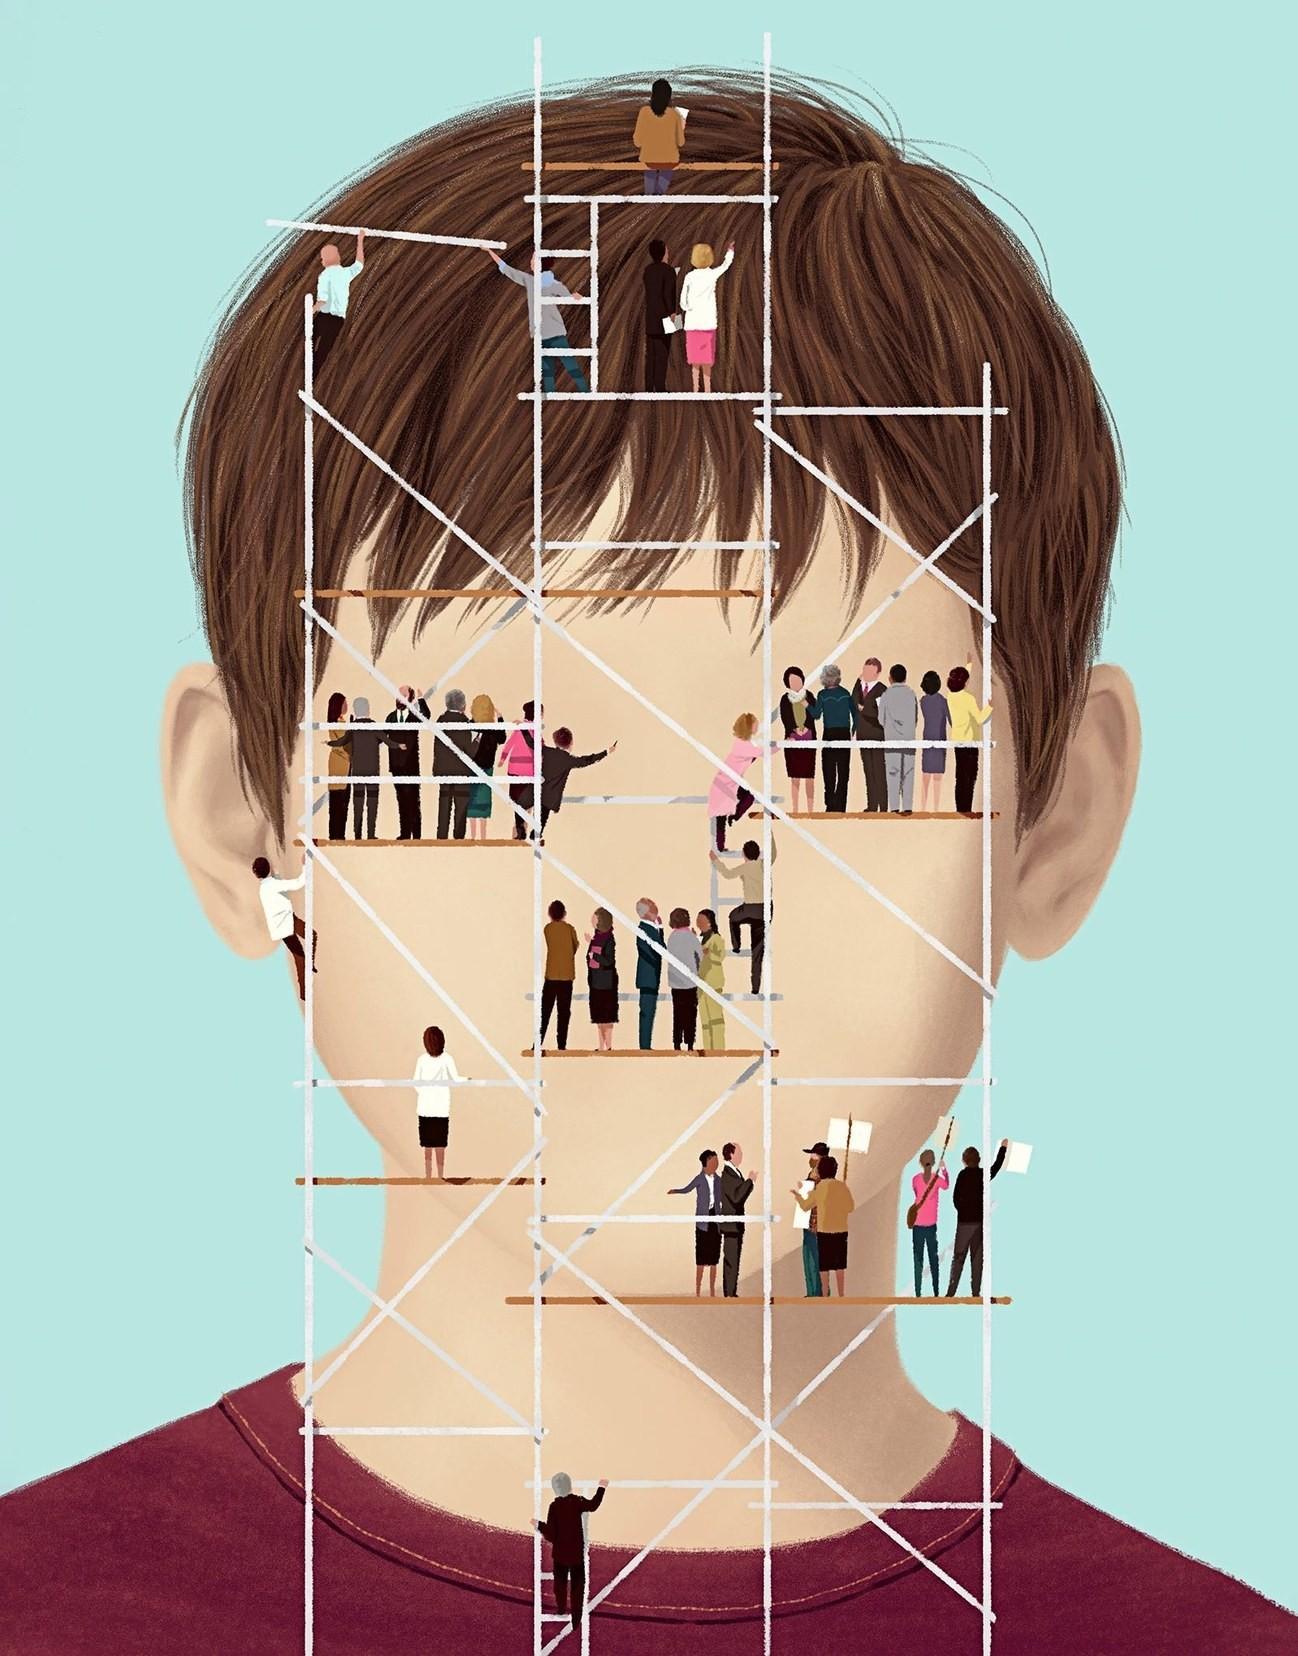 Asperger's: High Functioning ASD - cover